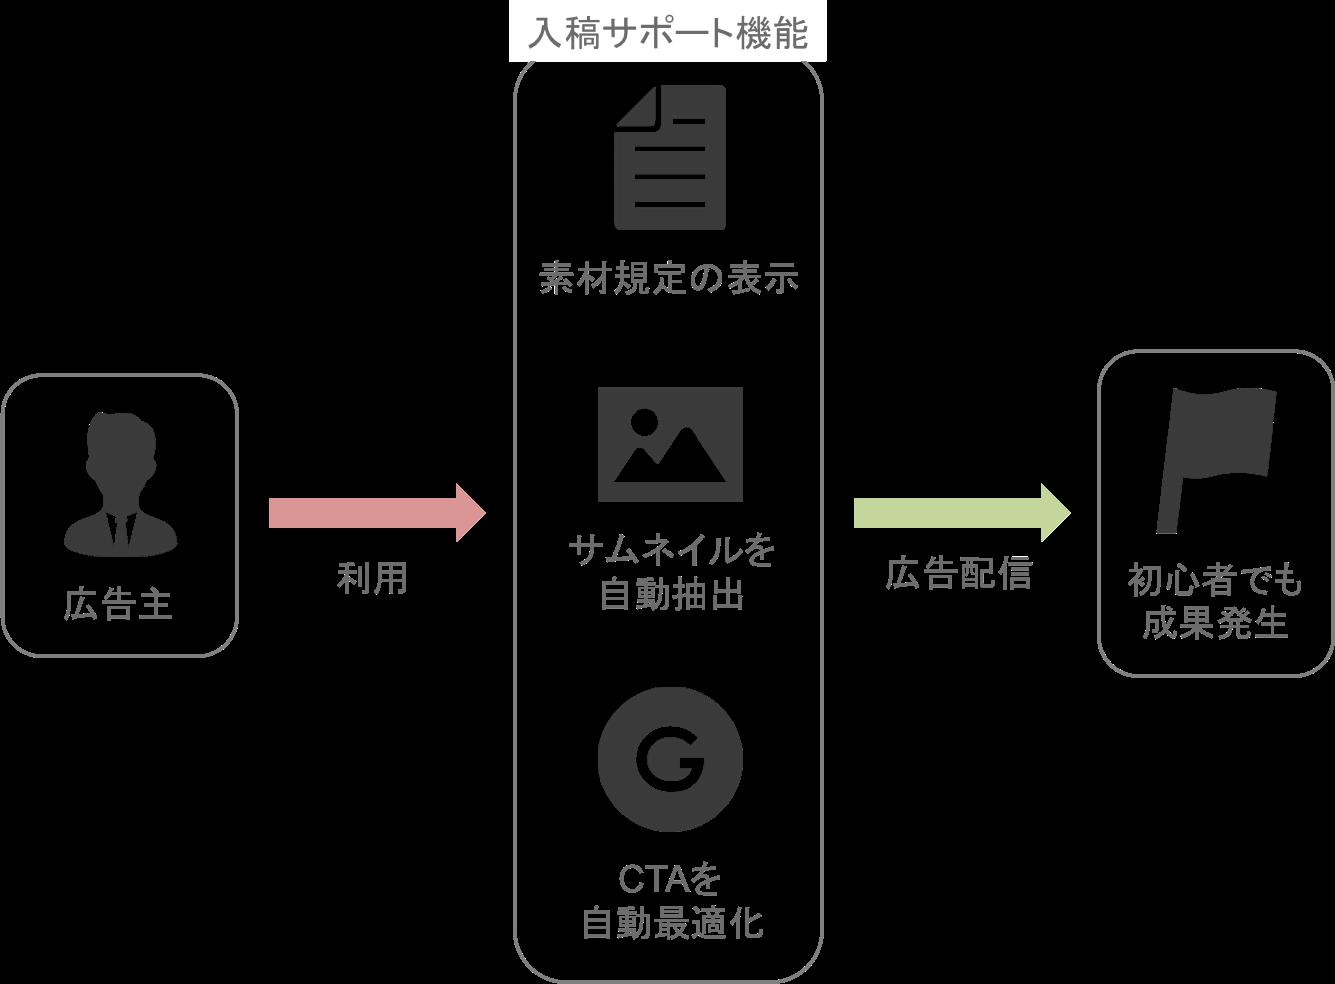 TikTokの運用型広告「TikTok Ads」の入稿サポート機能の仕組み